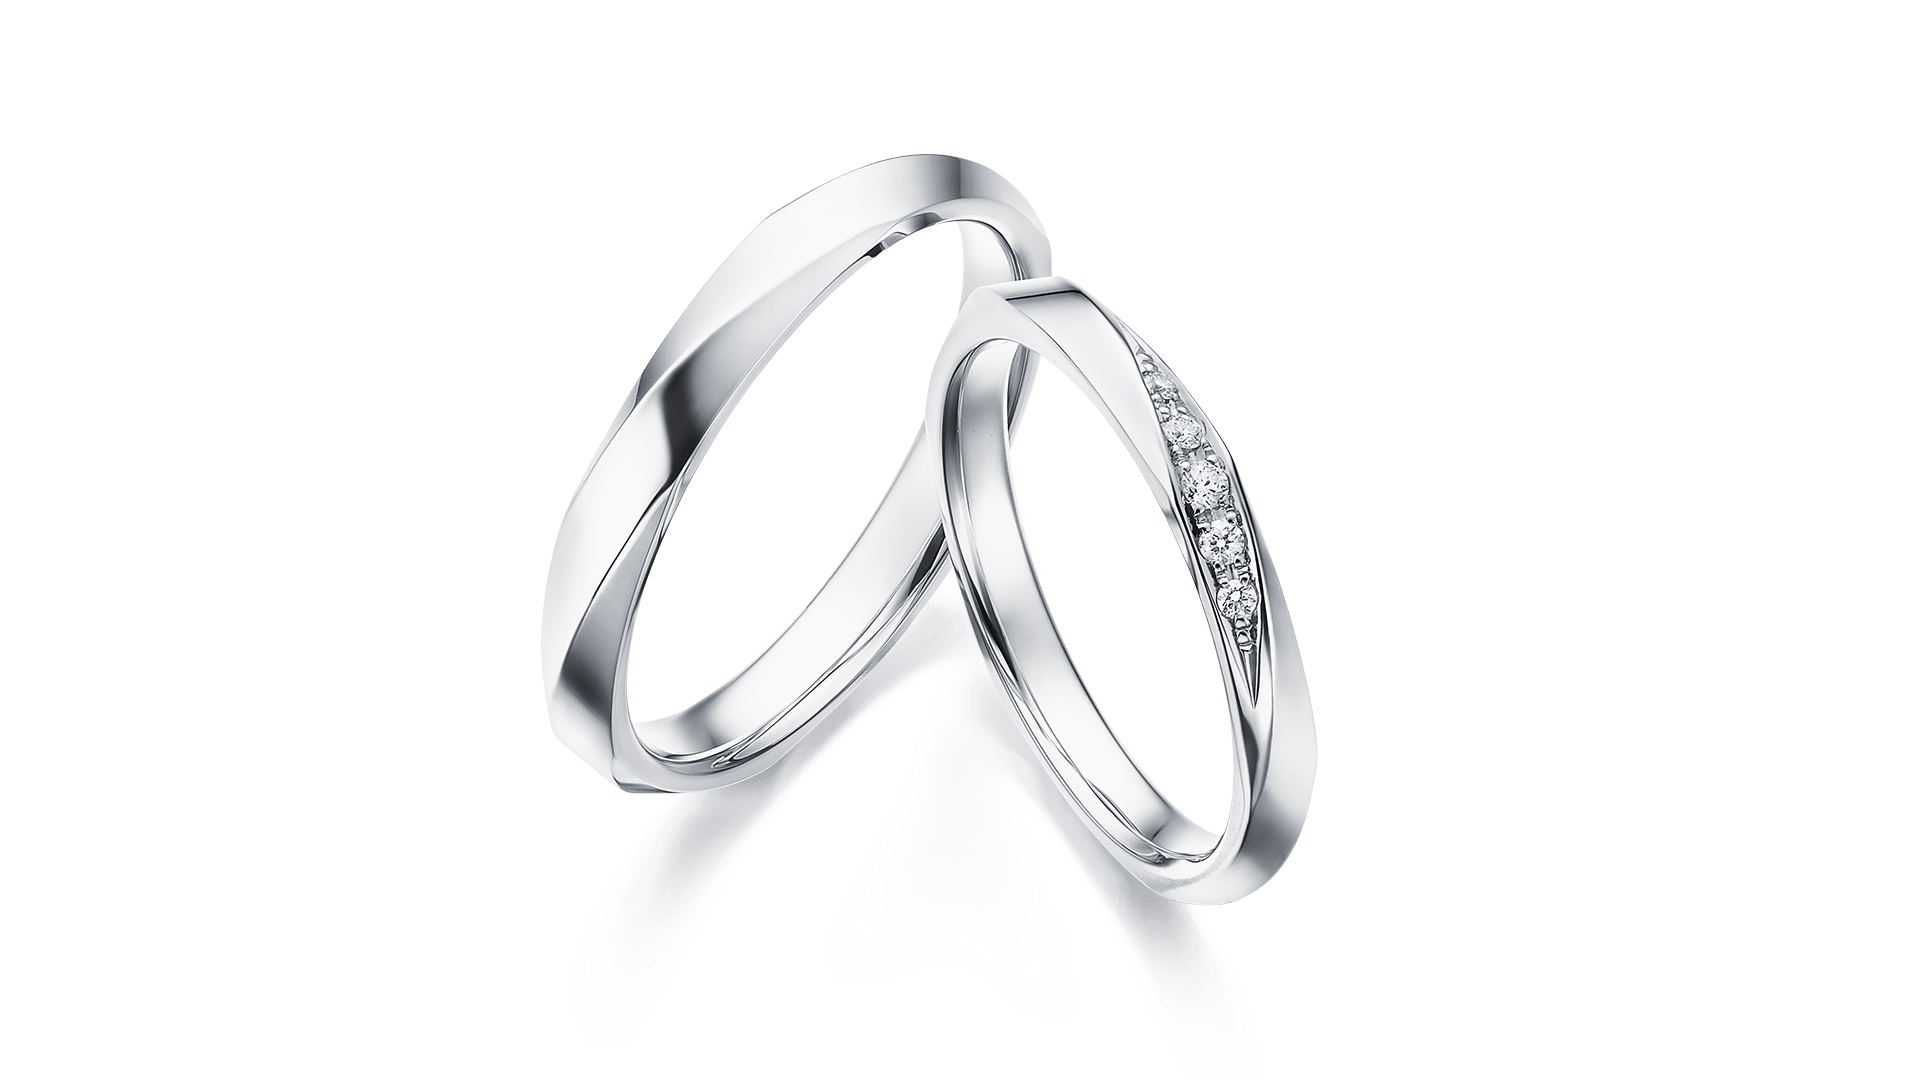 fortuna フォルトゥーナ | 結婚指輪サムネイル 2